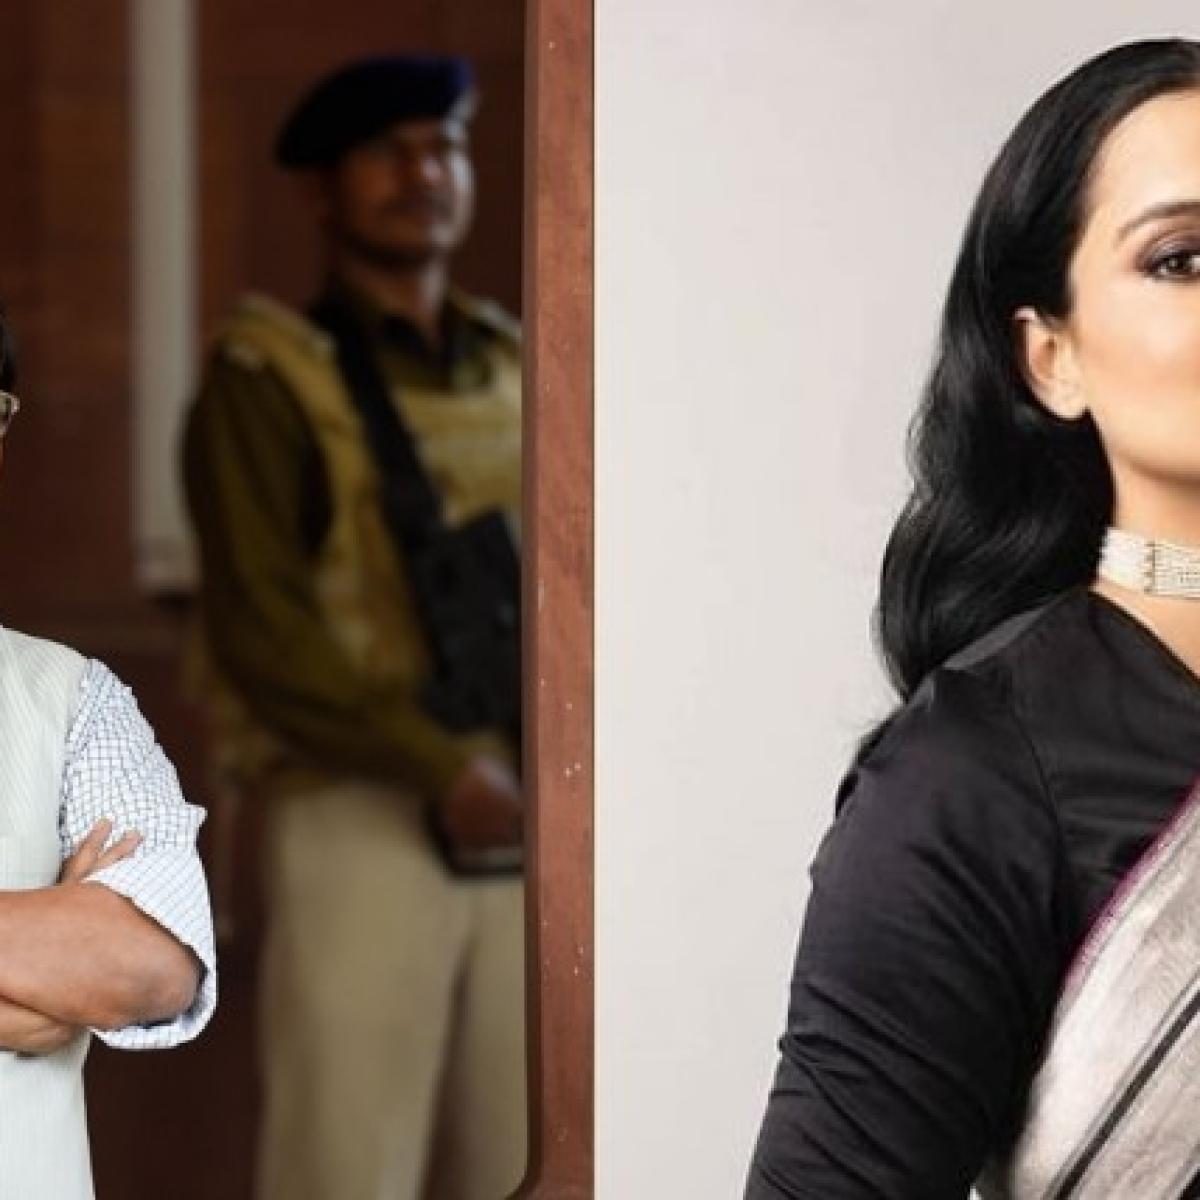 Kangana Ranaut's episode is over for Shiv Sena: Sanjay Raut